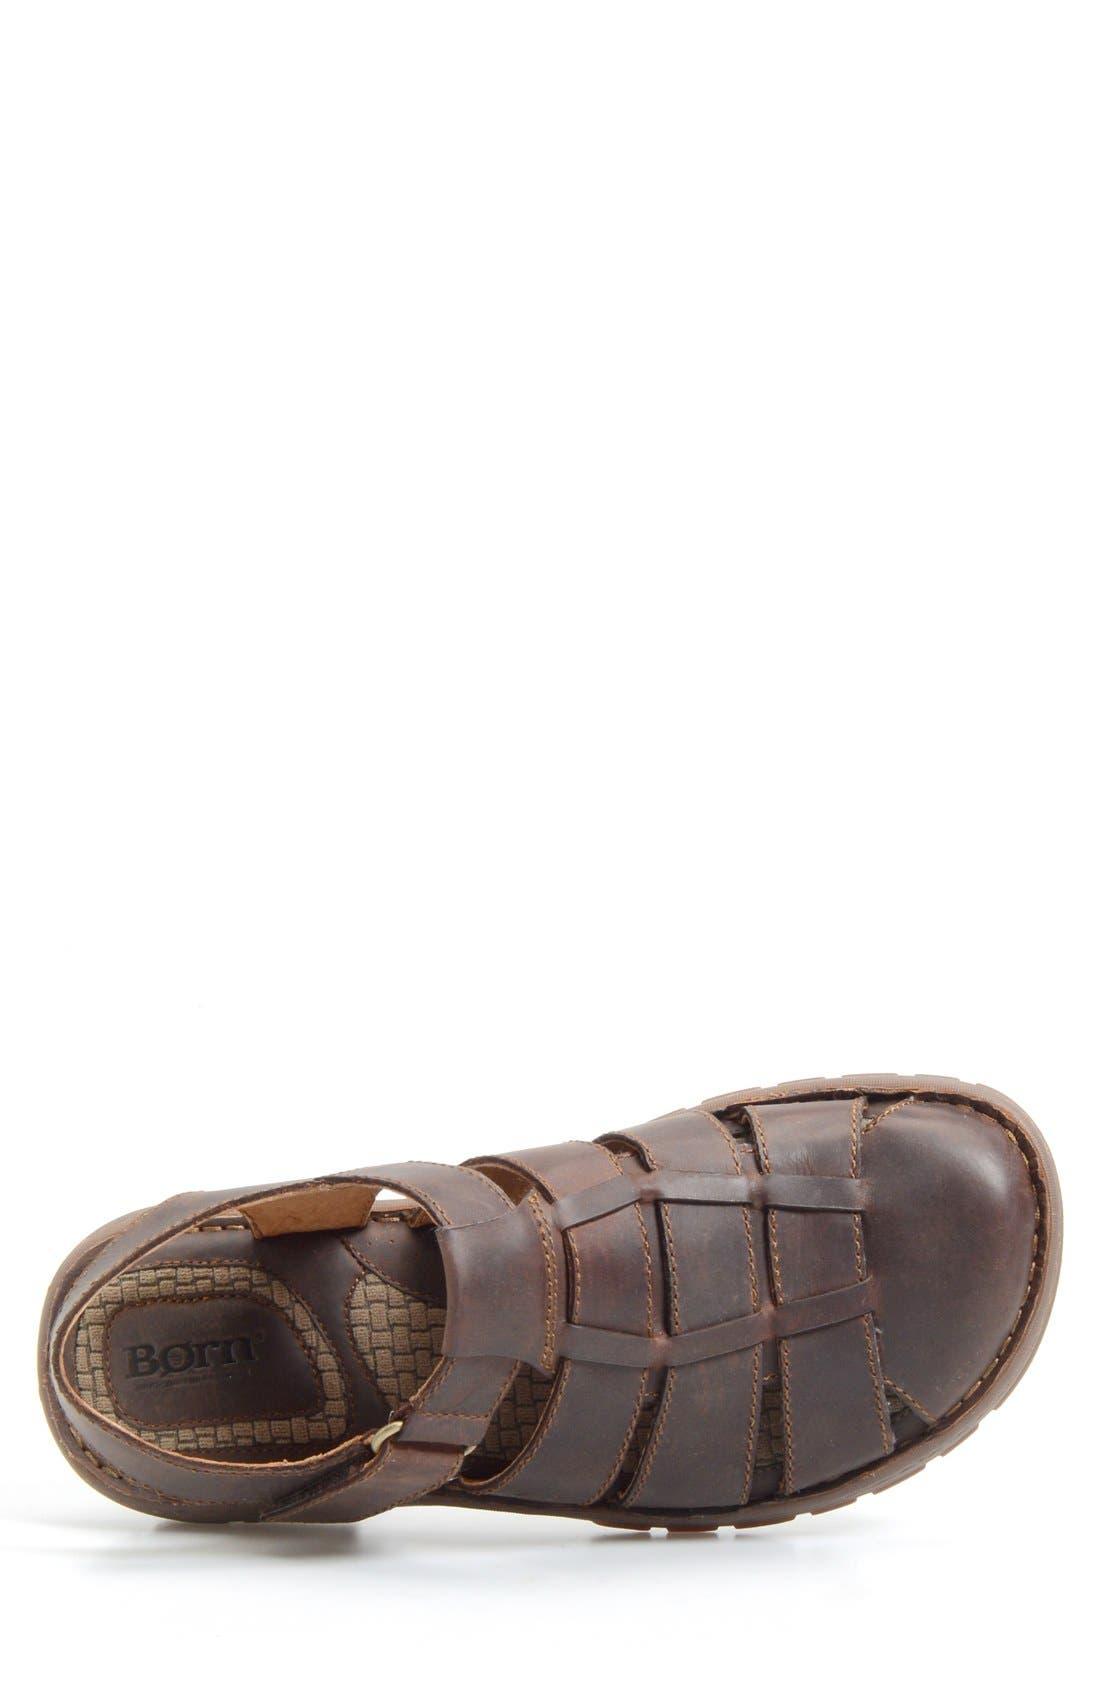 Alternate Image 3  - Børn 'Osmond' Leather Sandal (Men)